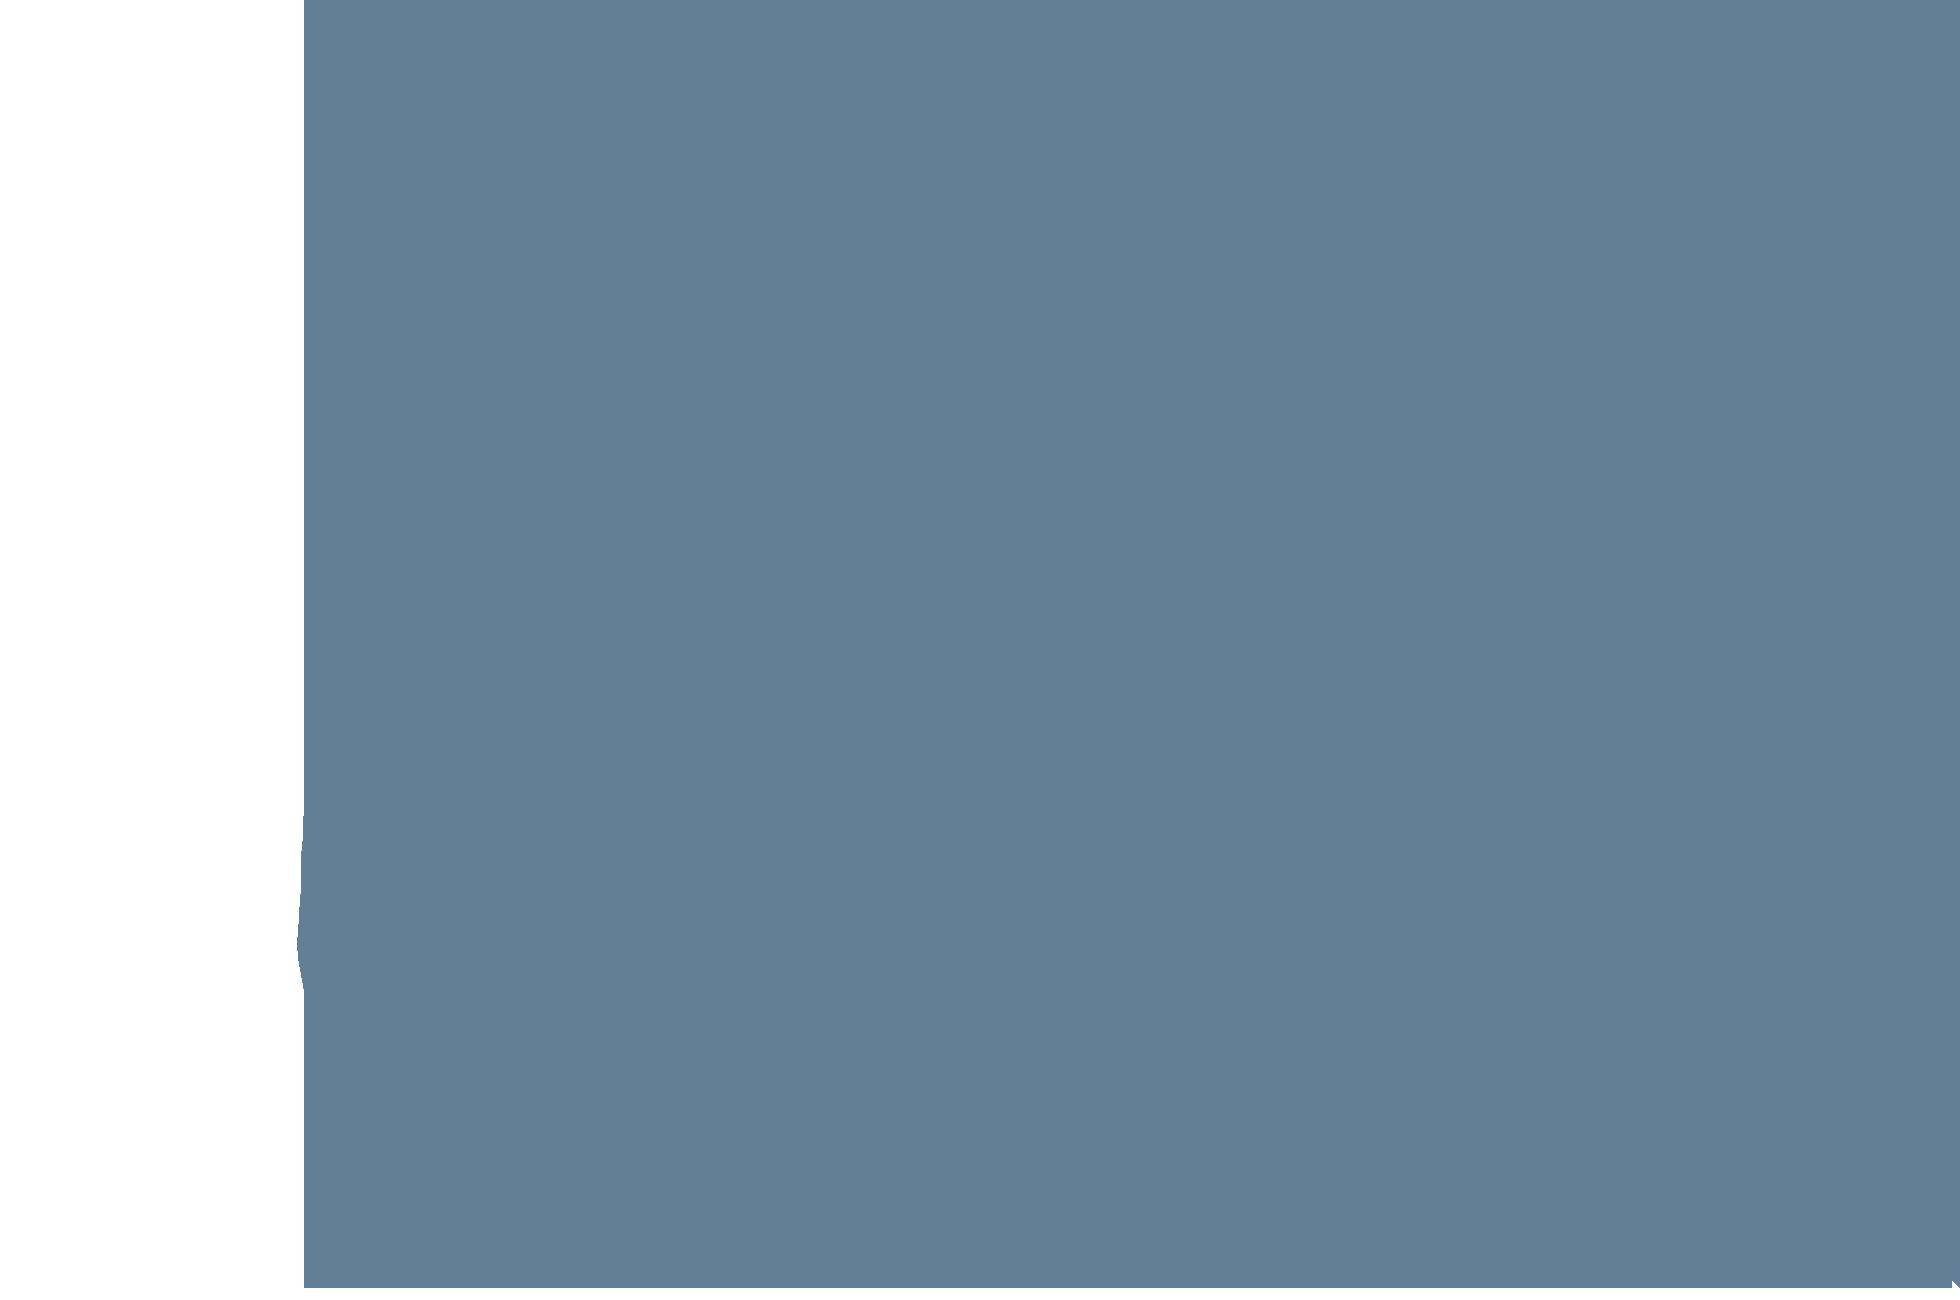 Blob 1.1-blue.png